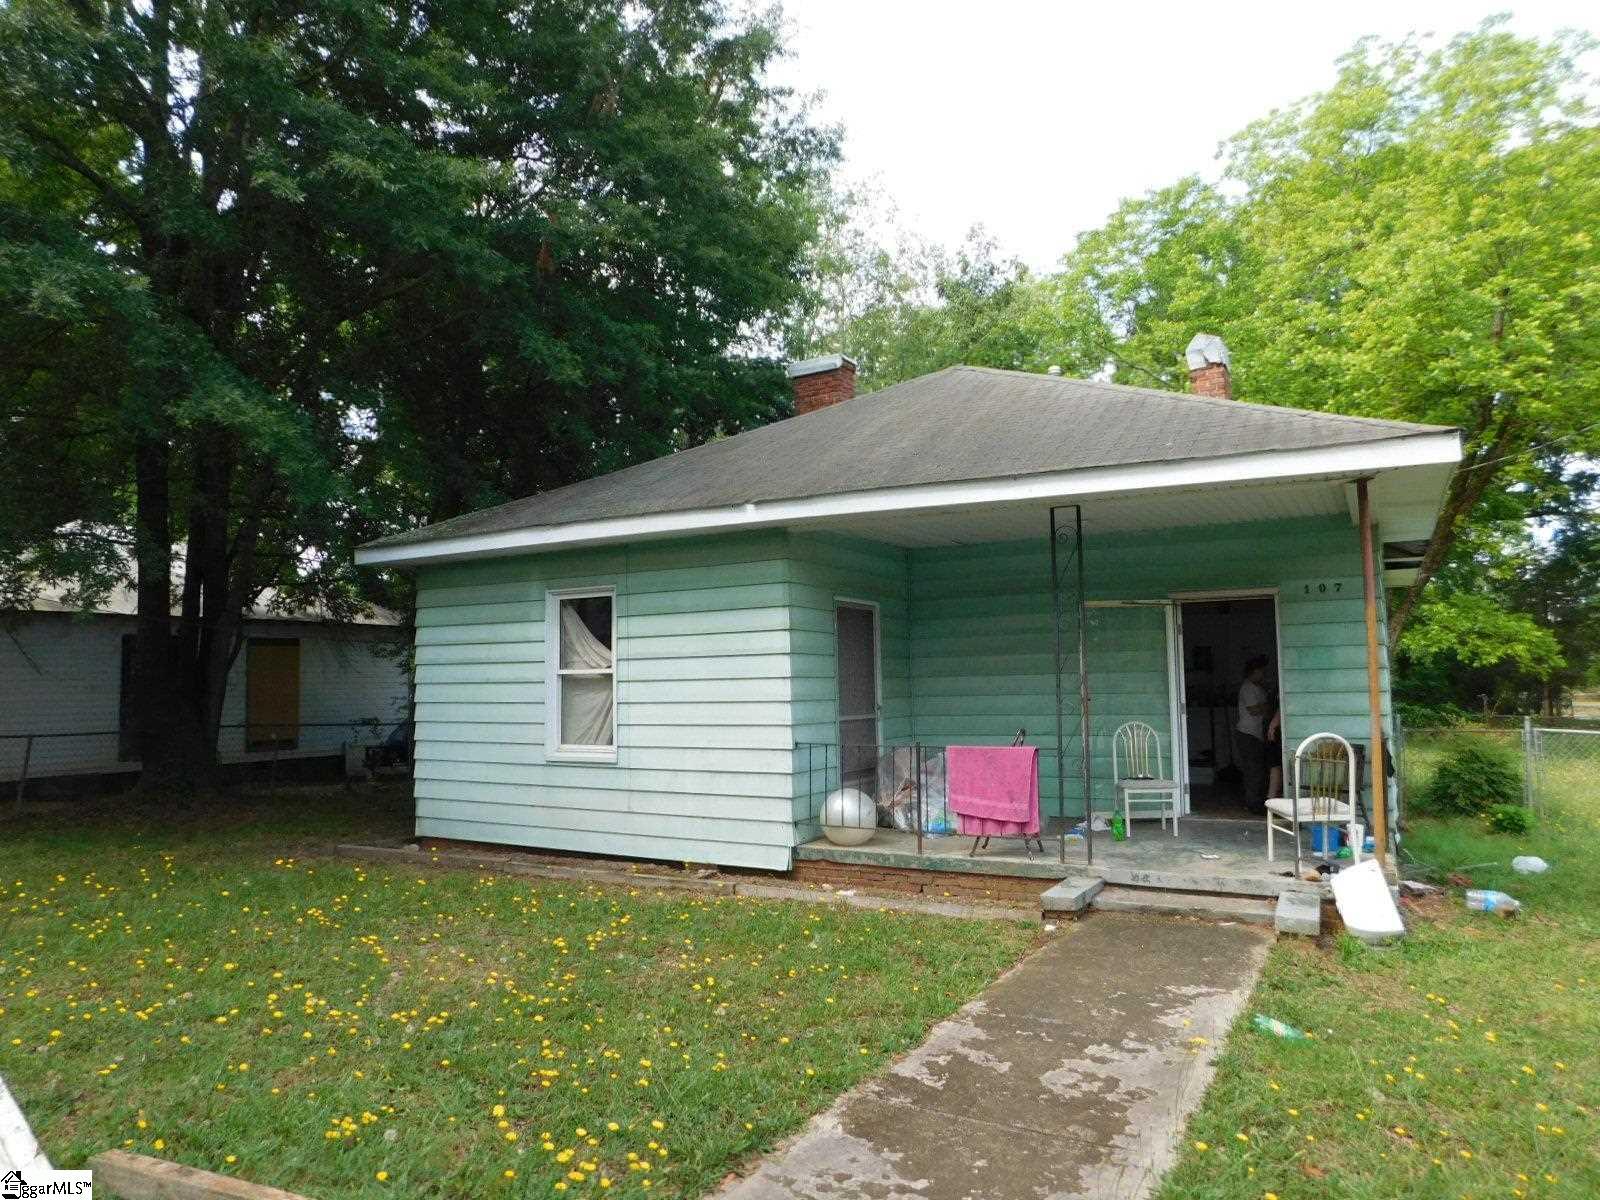 107 N Marion Street Joanna, SC 29351